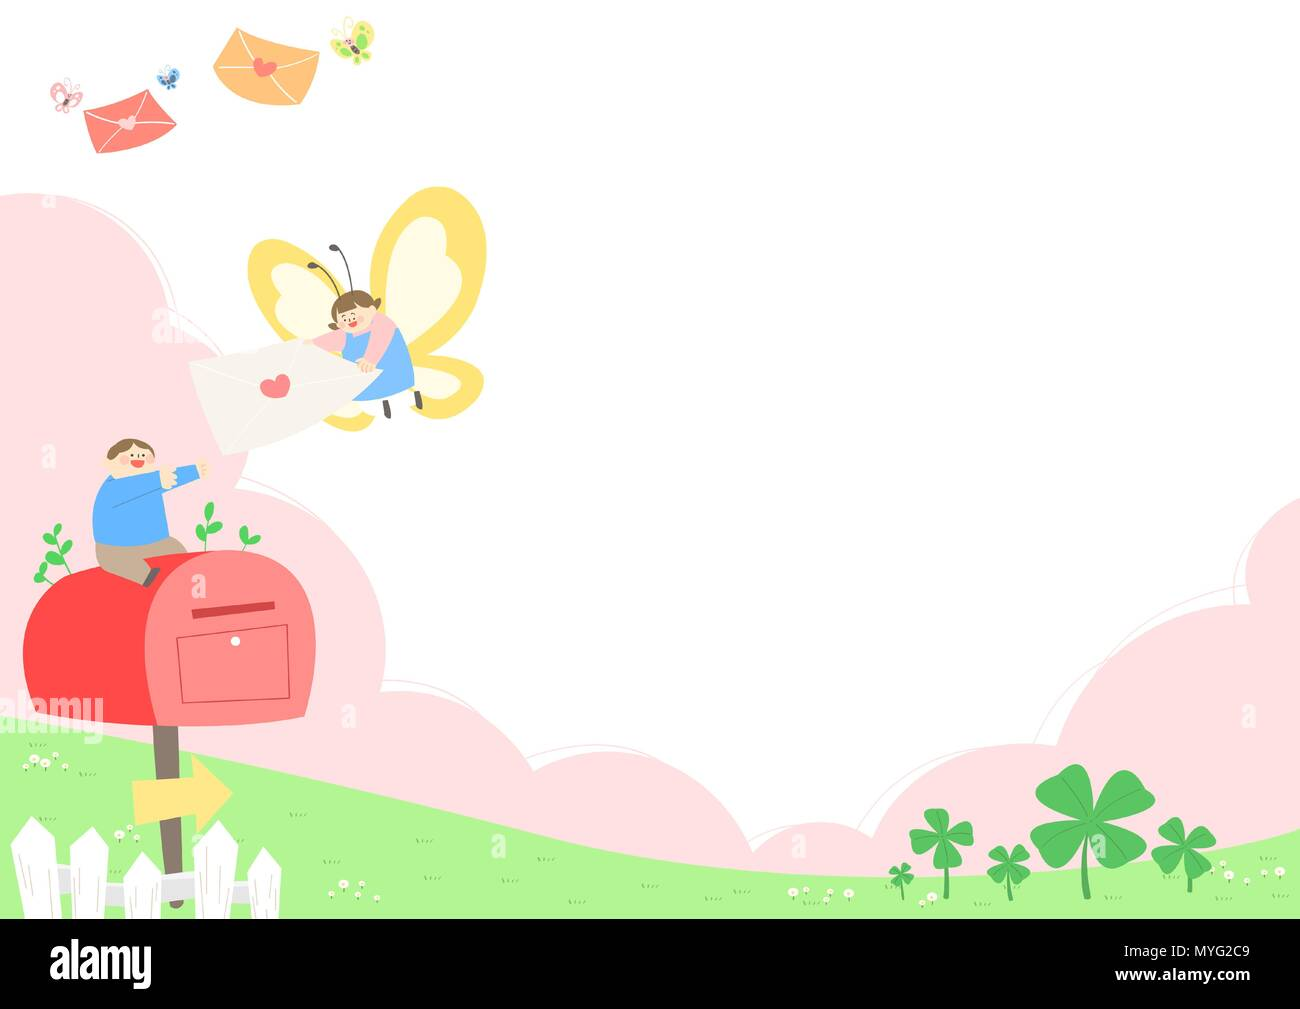 Vector - Welcome spring. Enjoy spring time illustration 008 - Stock Vector